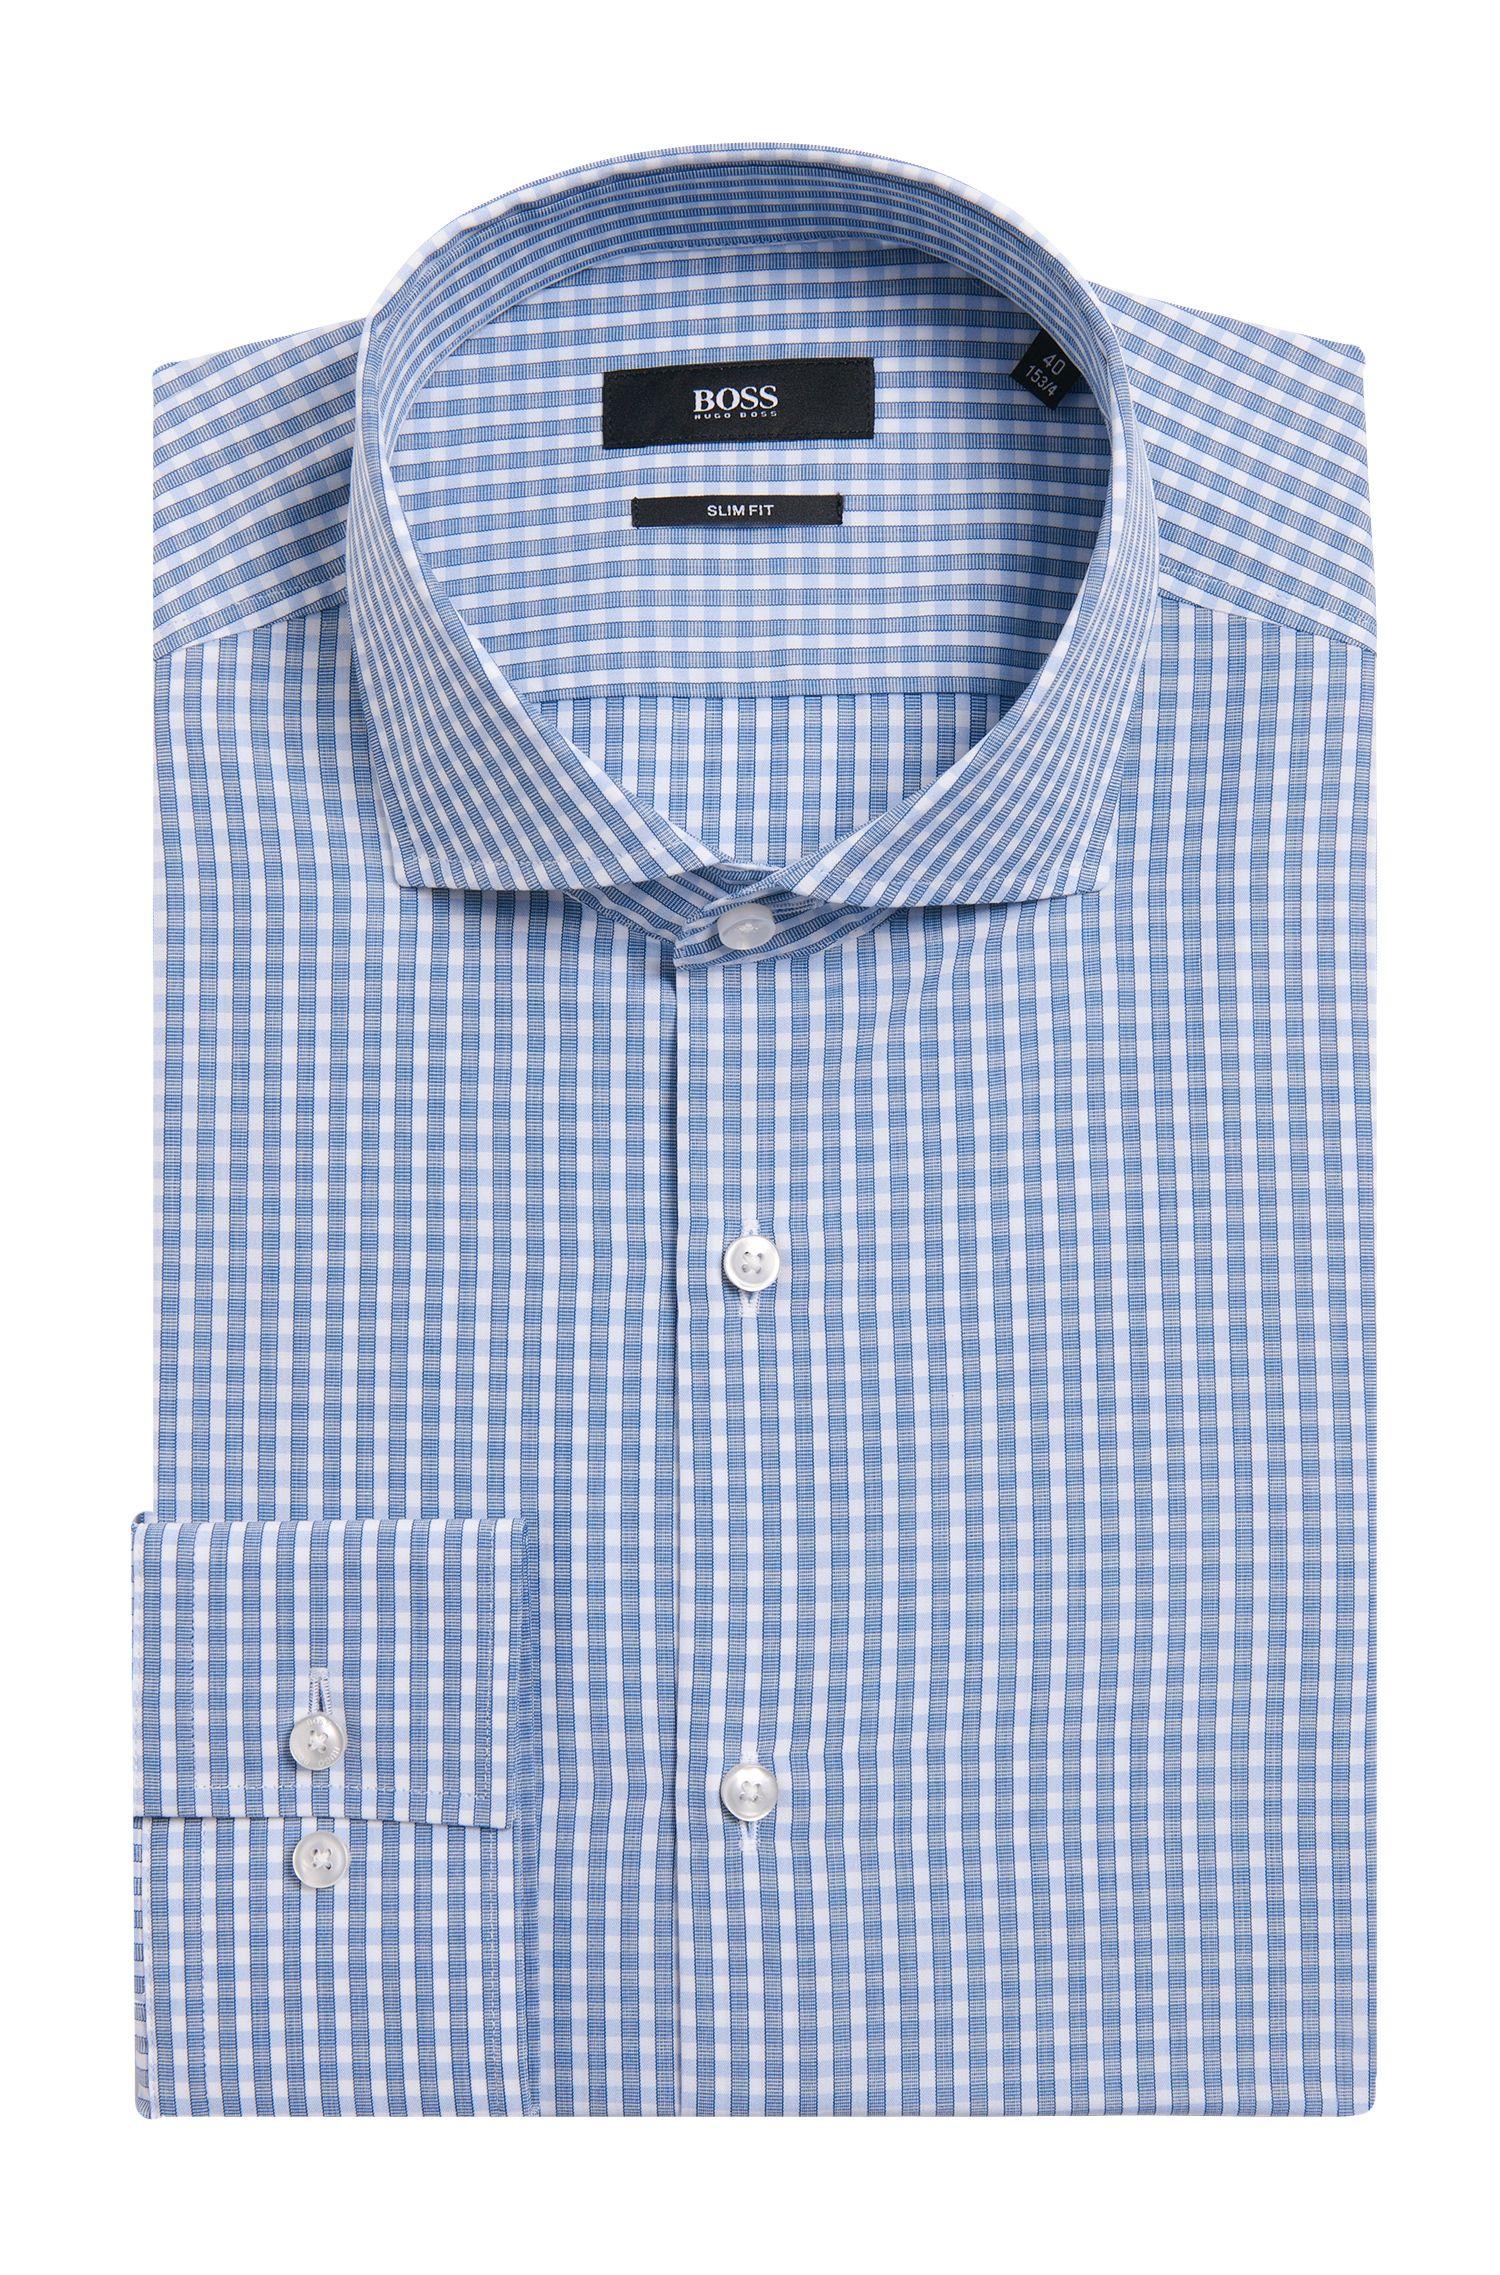 'Jason' | Slim Fit, Cotton Dress Shirt